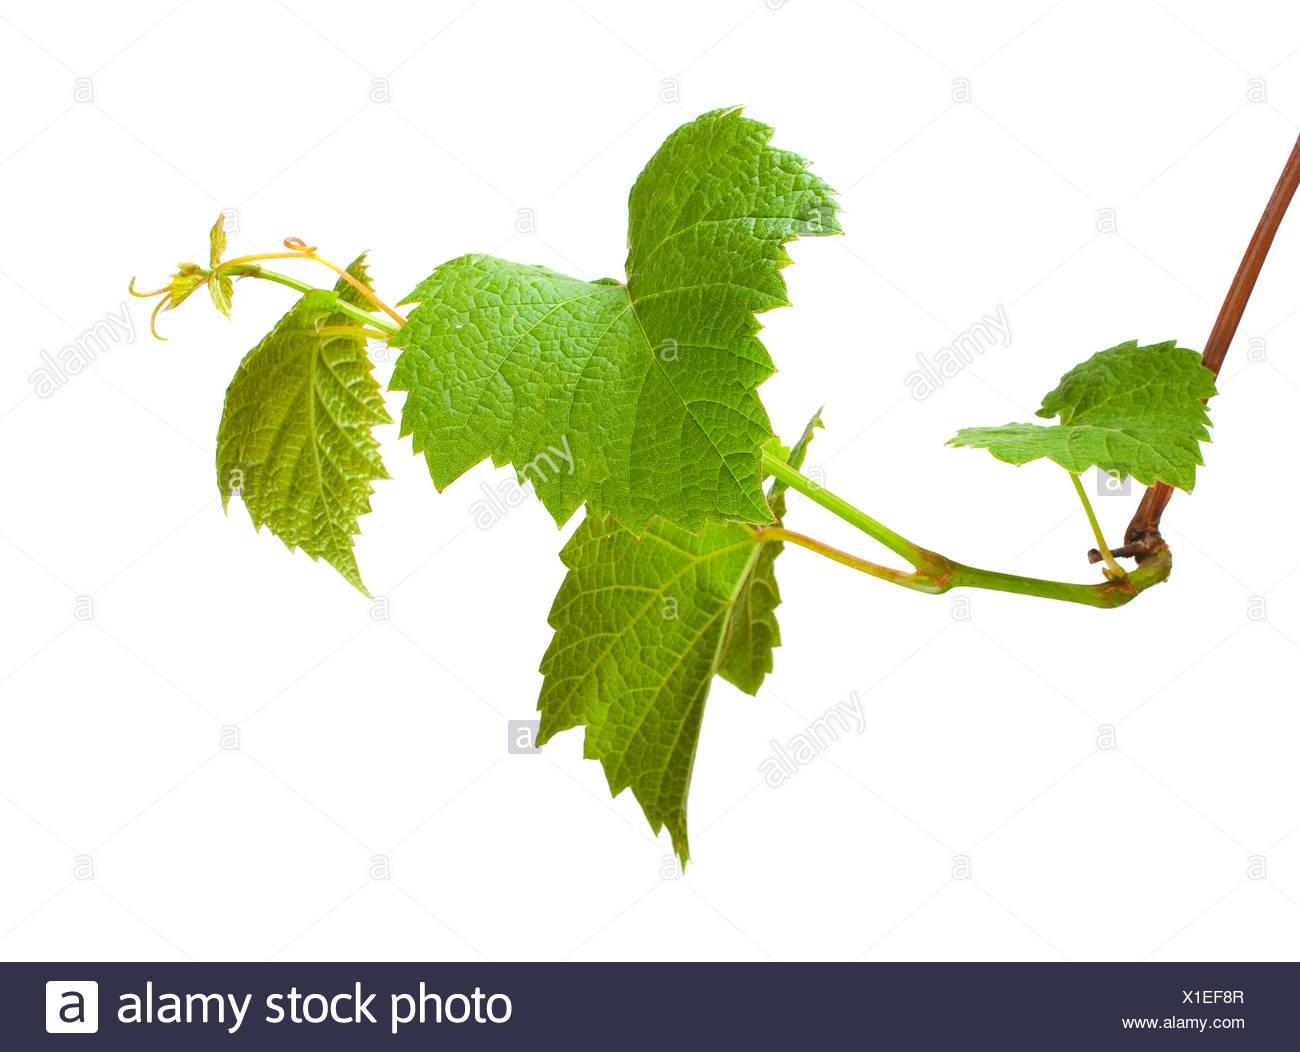 green grape germ - Stock Image